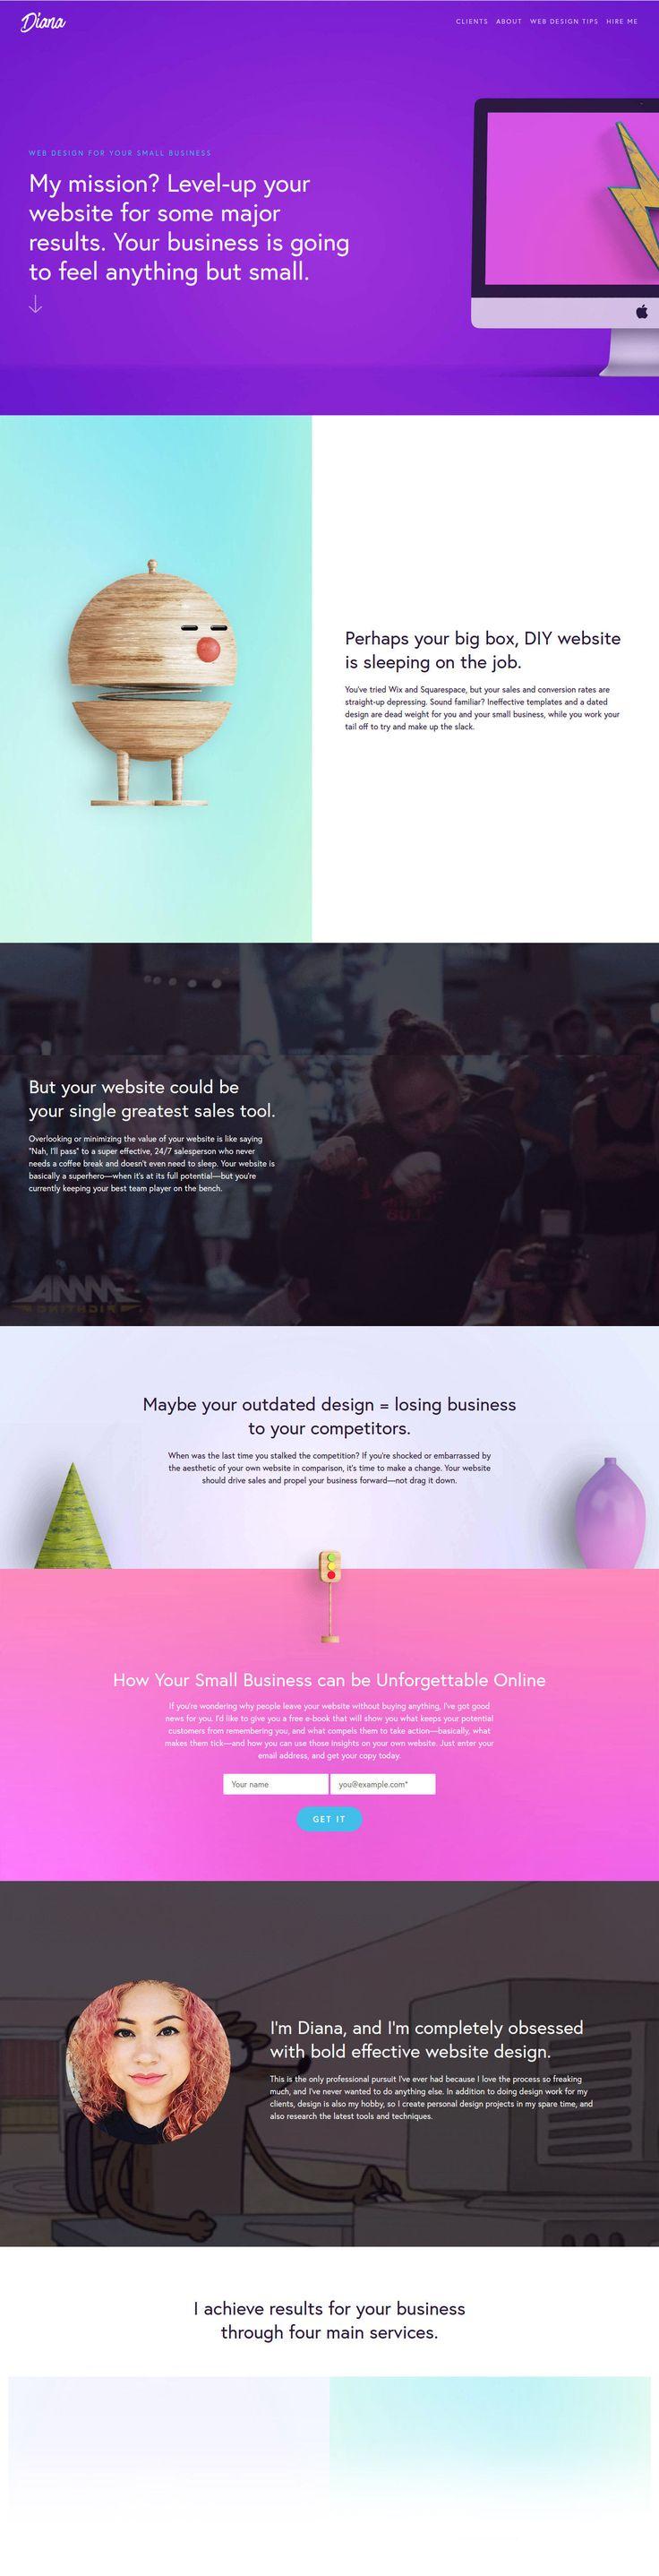 Diana.nu (More web design inspiration at topdesigninspiration.com) #design #web #webdesign #sitedesign #responsive #ux #ui